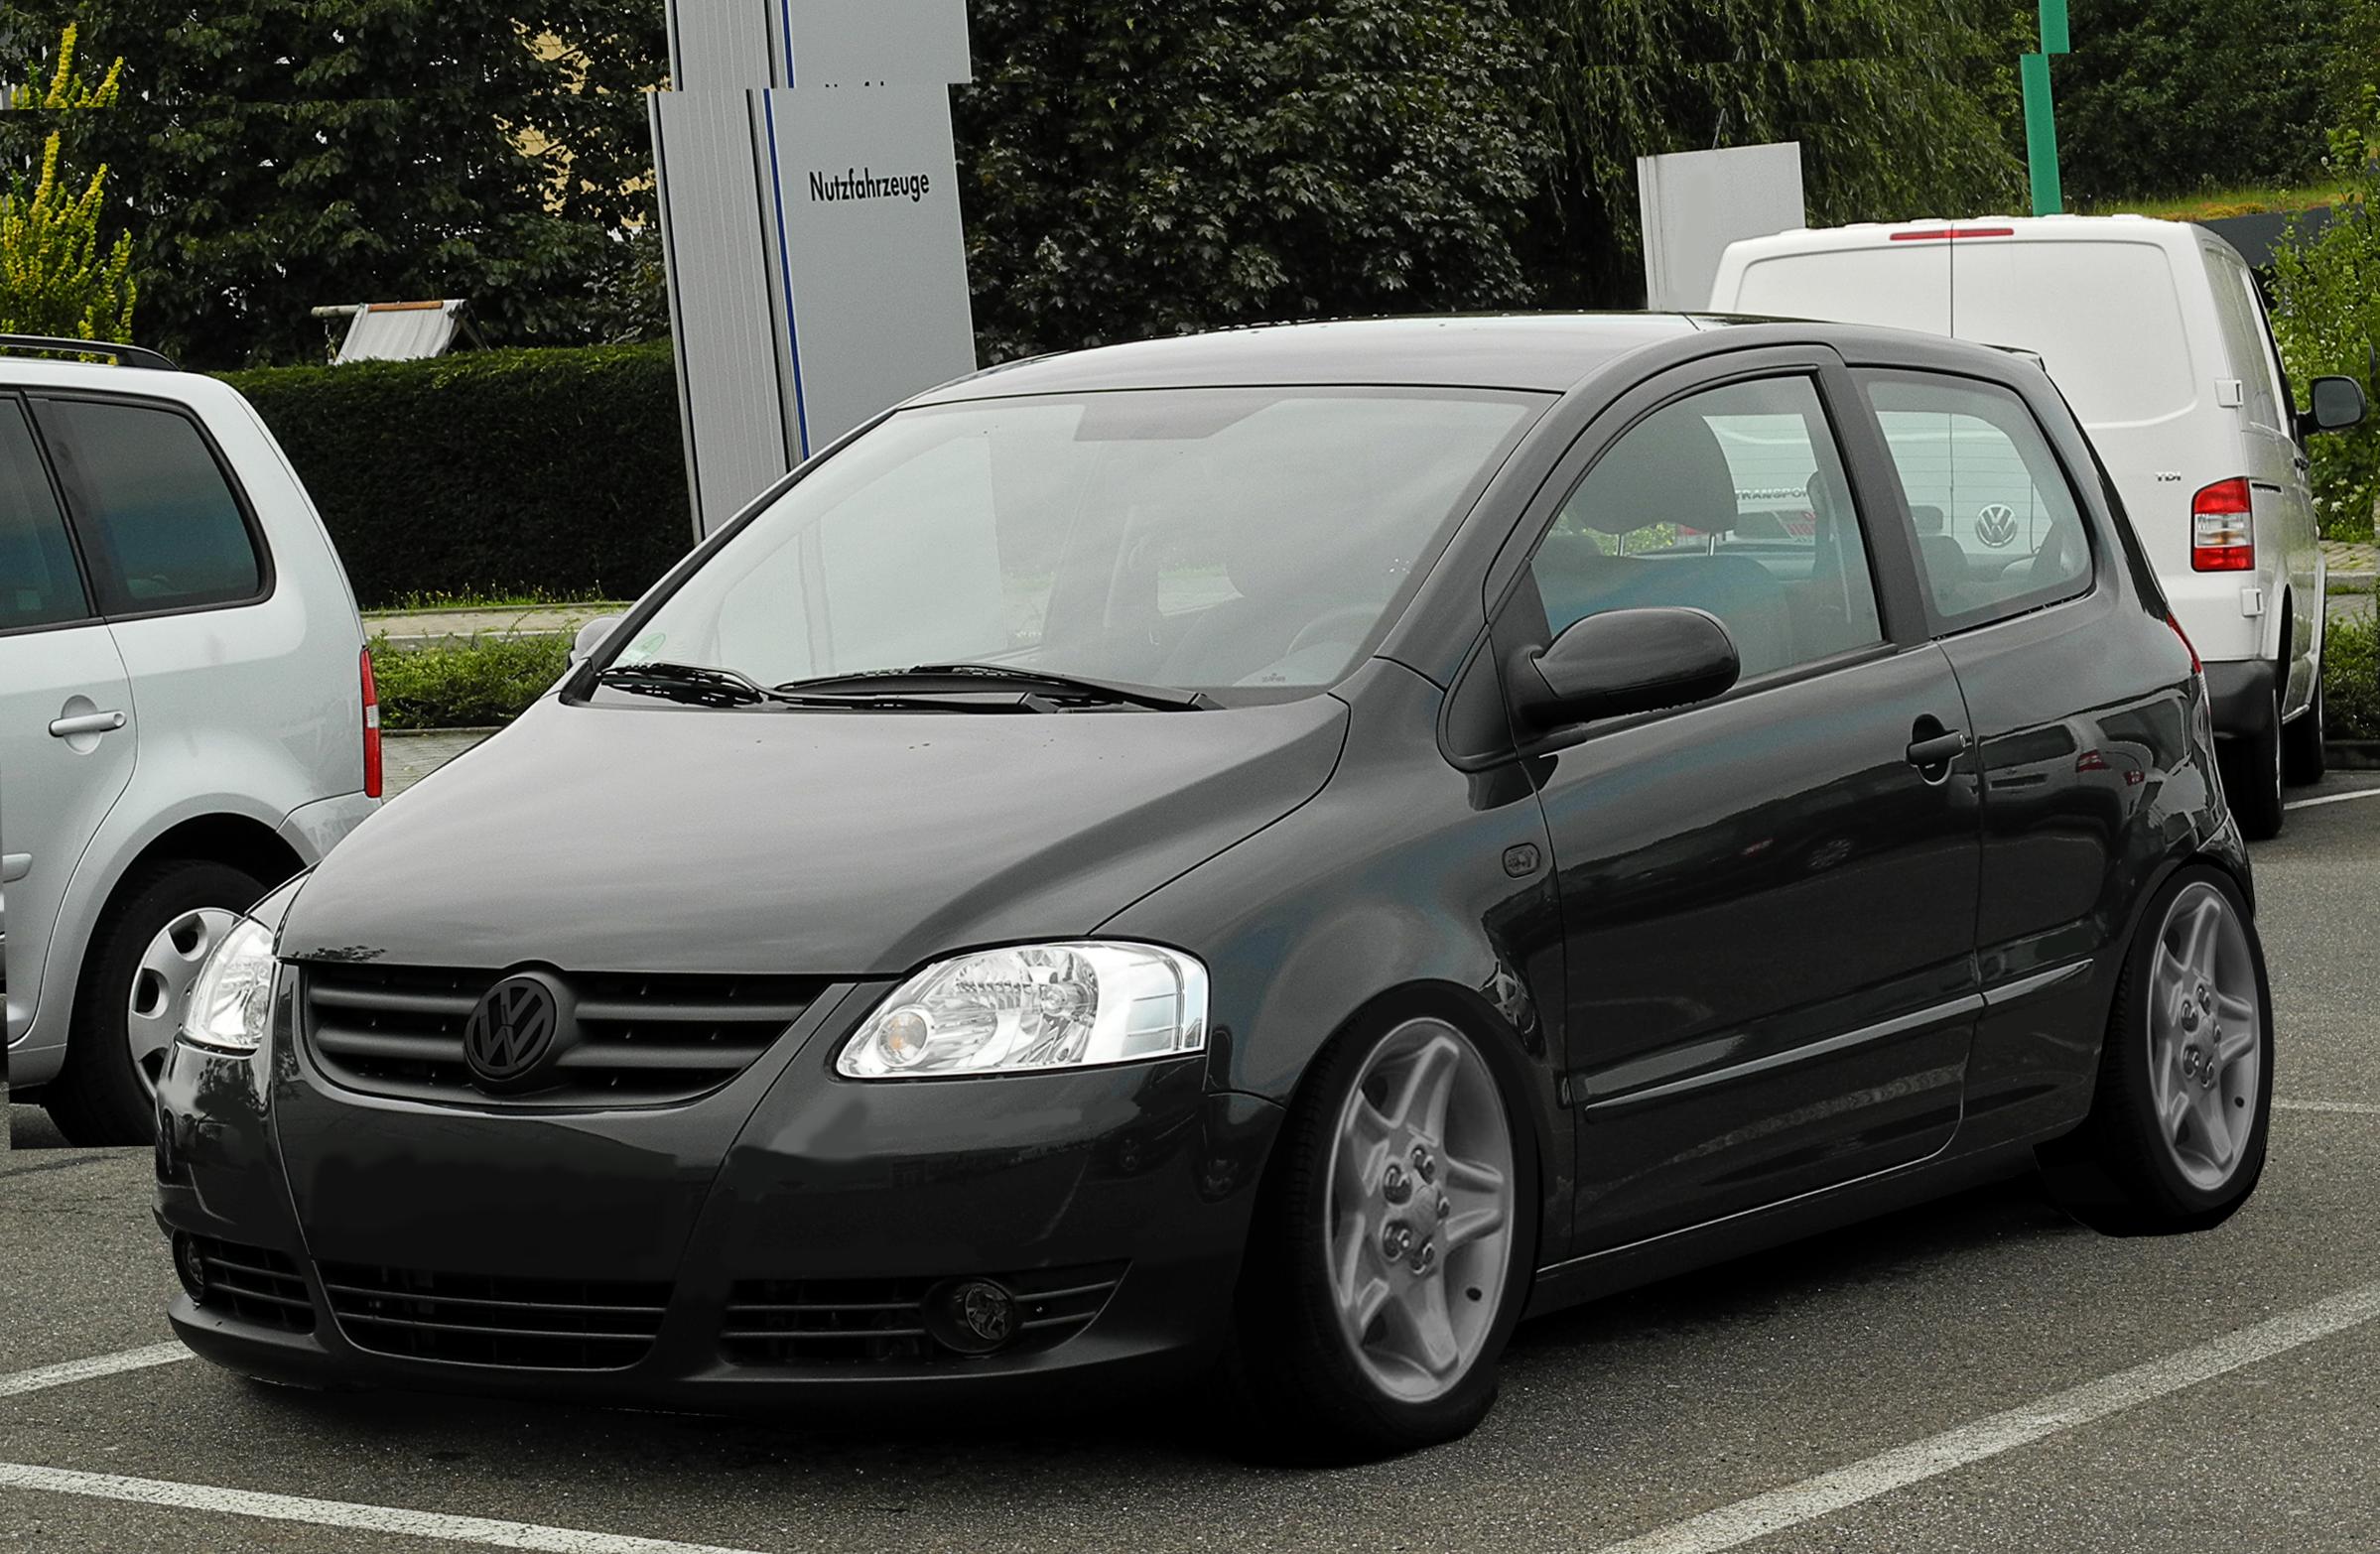 VW Caddy 2.0 TDI specs, performance data - FastestLaps.com